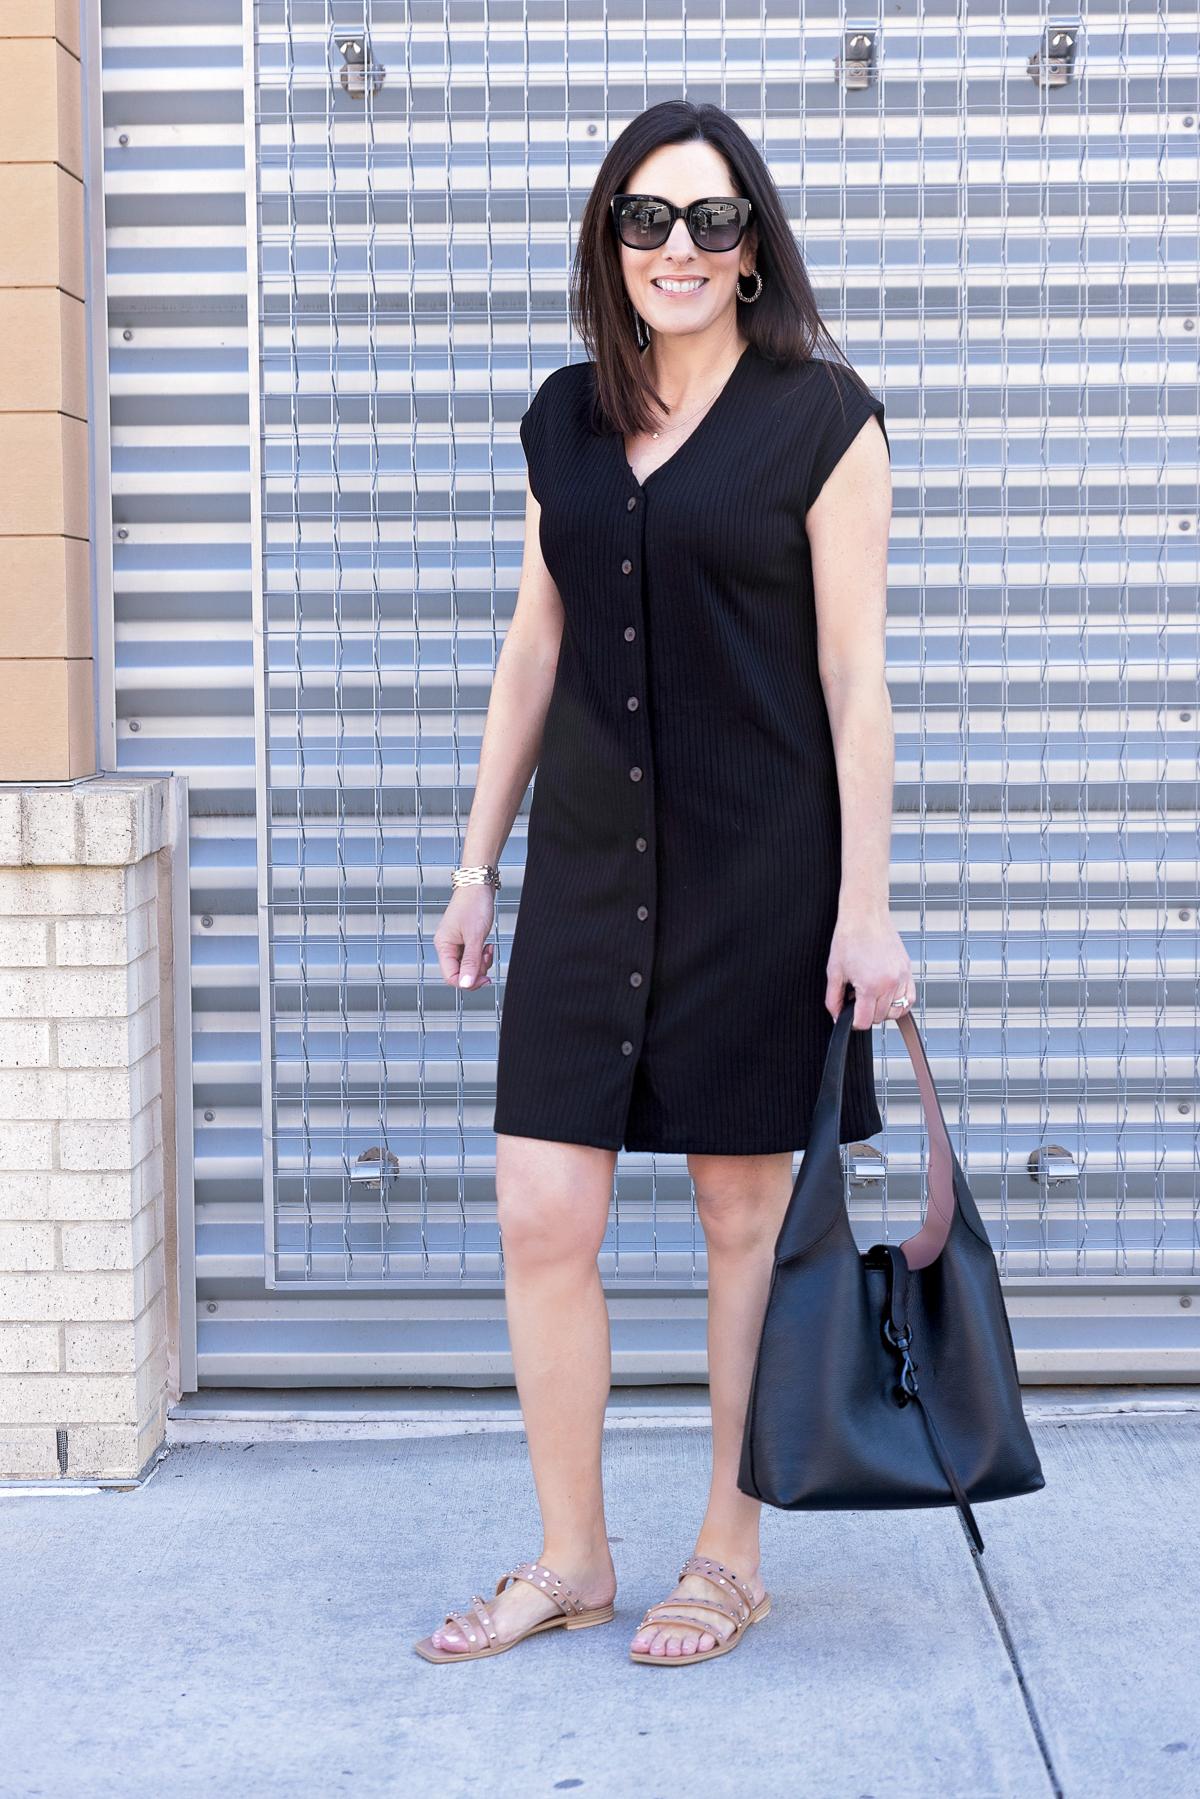 Casual Alternatives to Shorts: Shift Dress